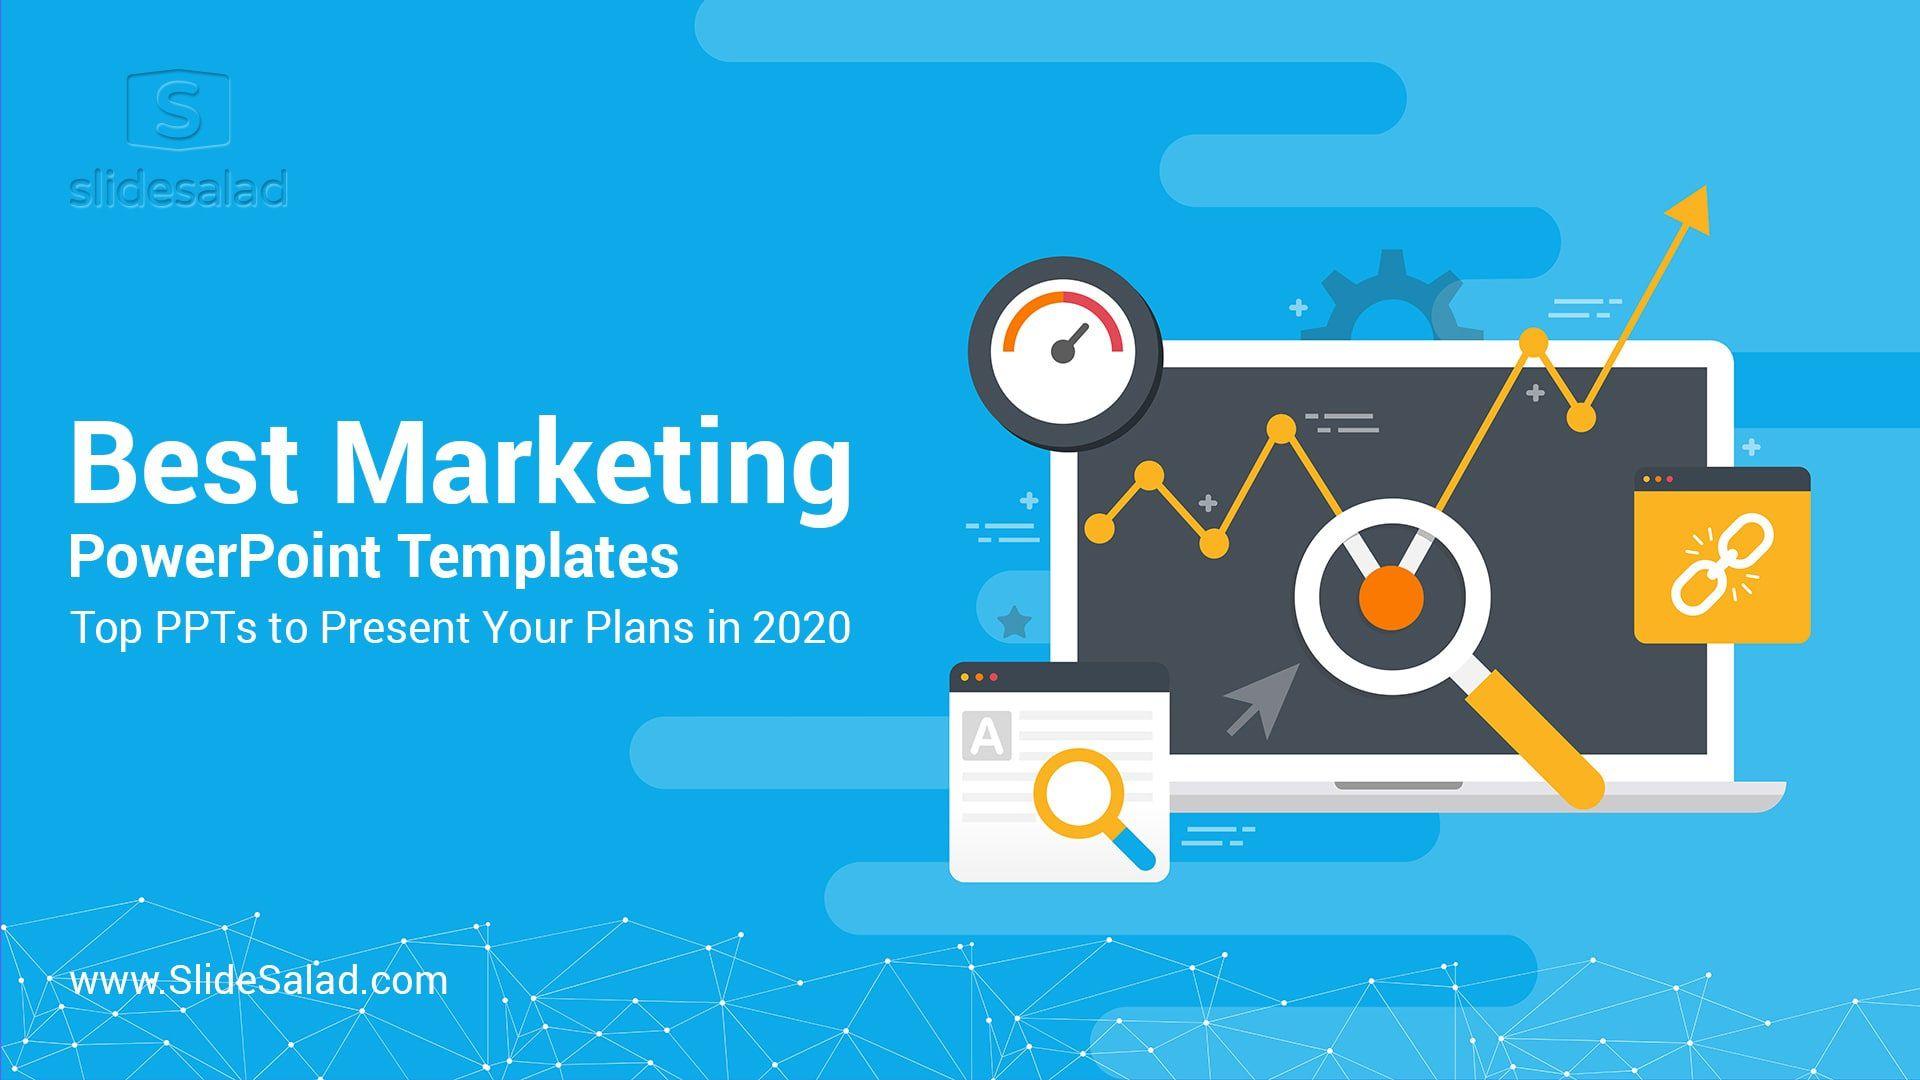 003 Impressive Free Digital Marketing Plan Template Ppt Photo Full